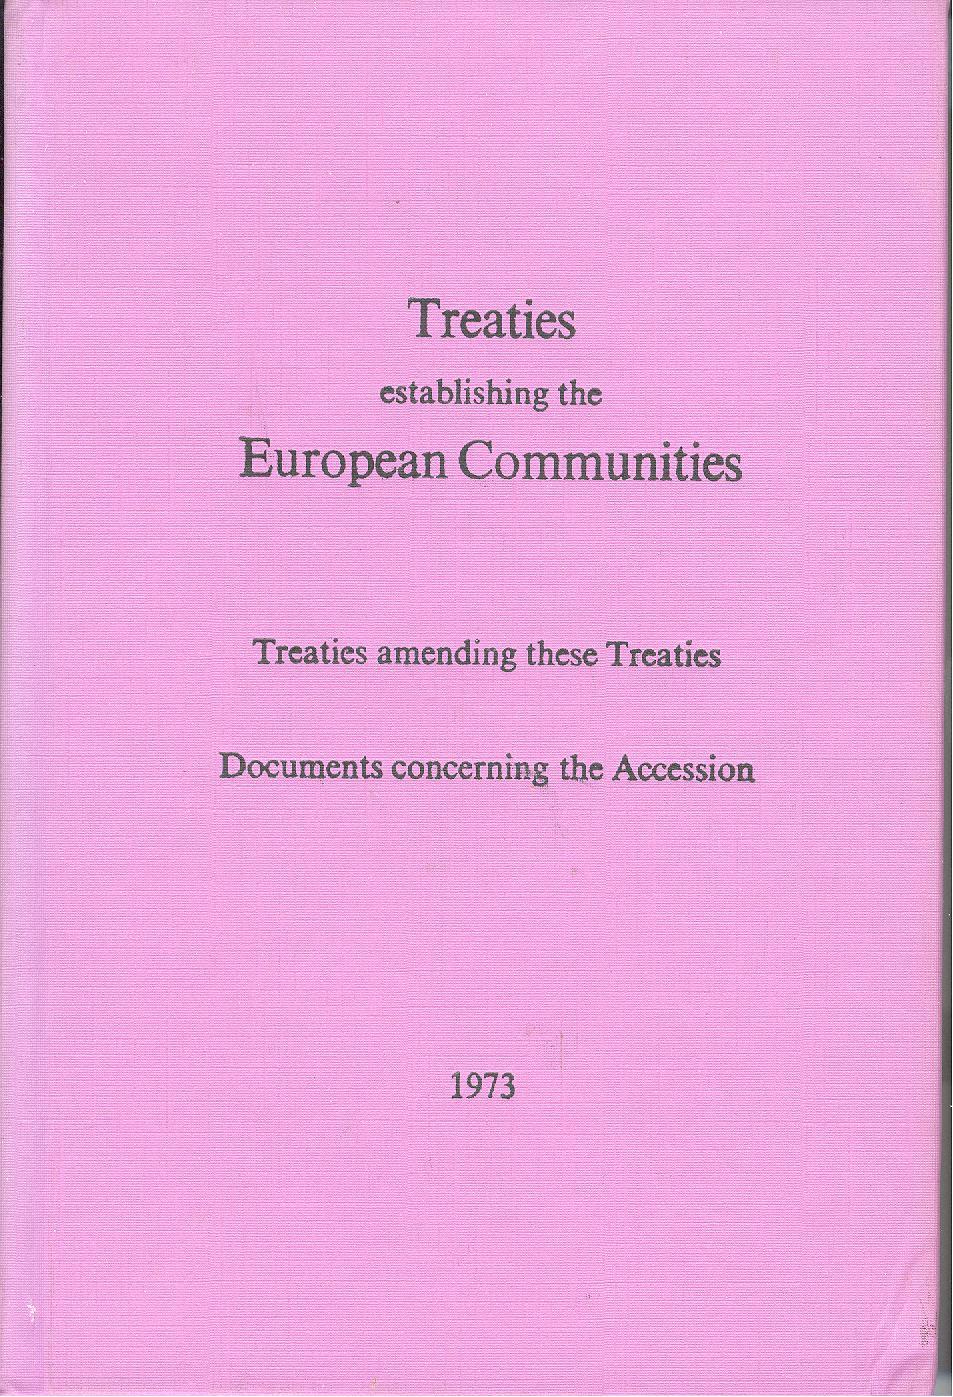 Treaties establishing the European Communities